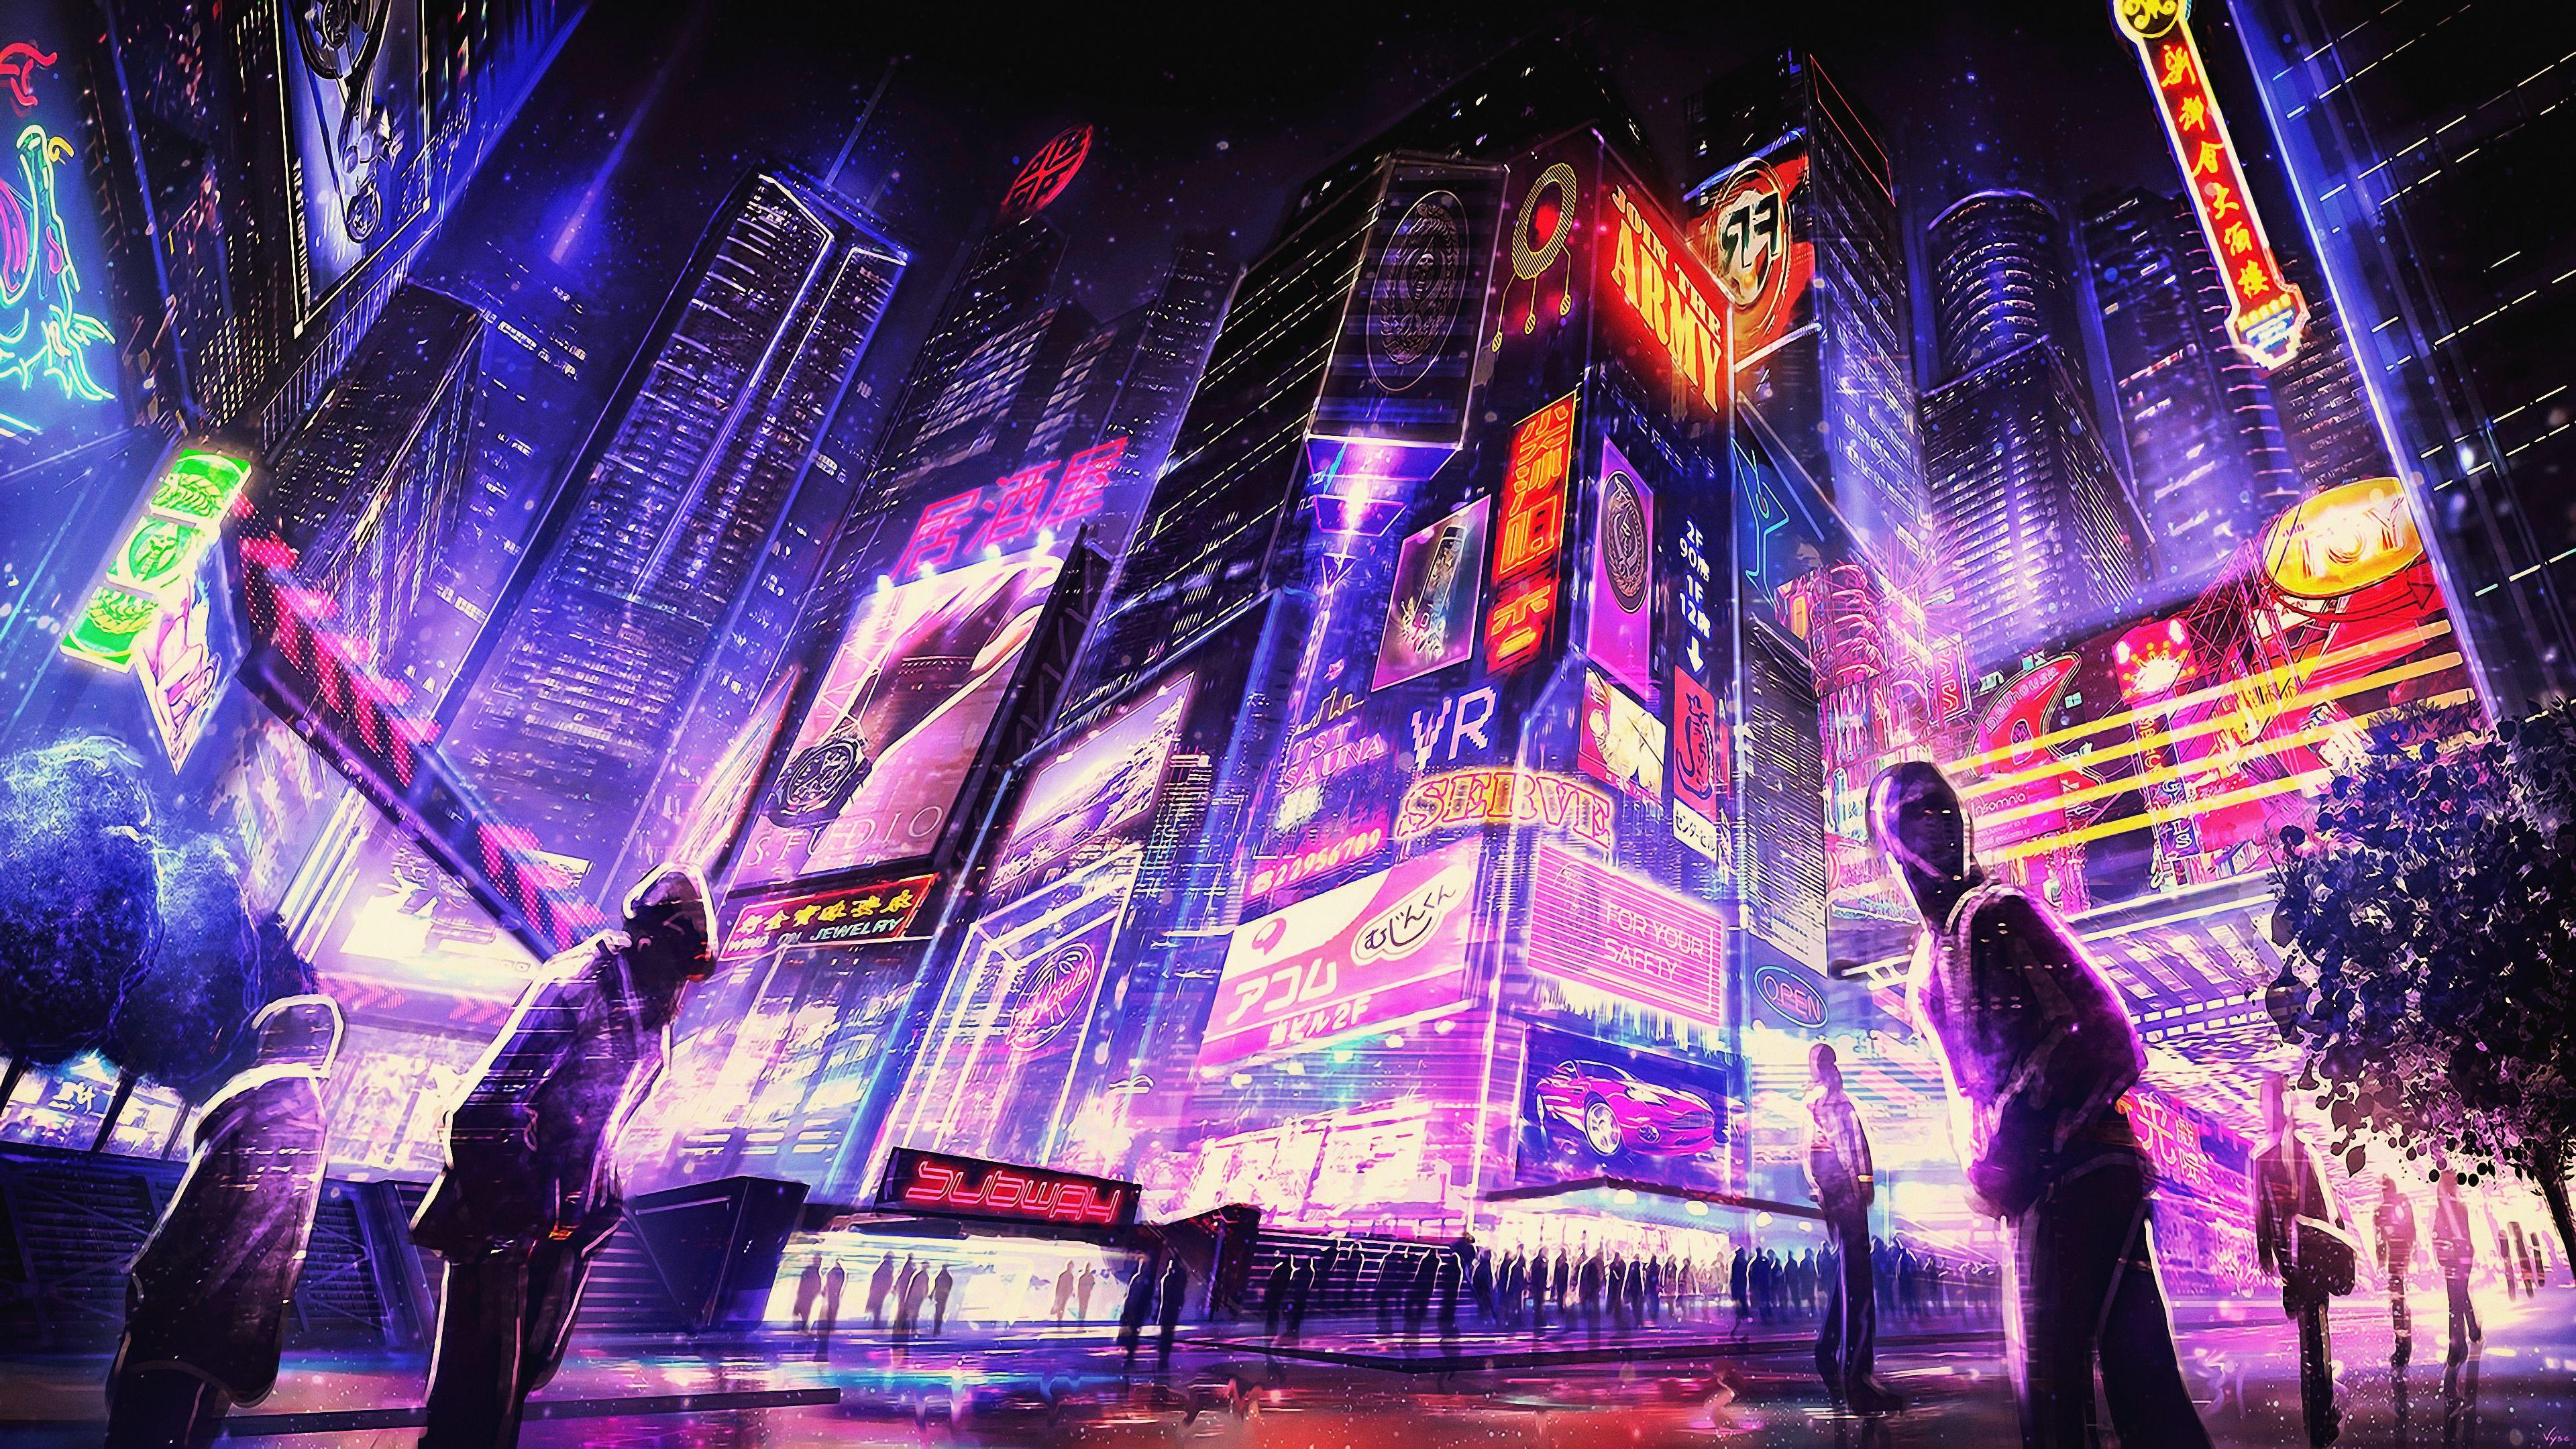 General 3840x2160 Night Cyberpunk Futuristic City Artwork Digital Art Concept Art Fantasy Art Futuristic City Cyberpunk City Futuristic City Sci Fi Wallpaper